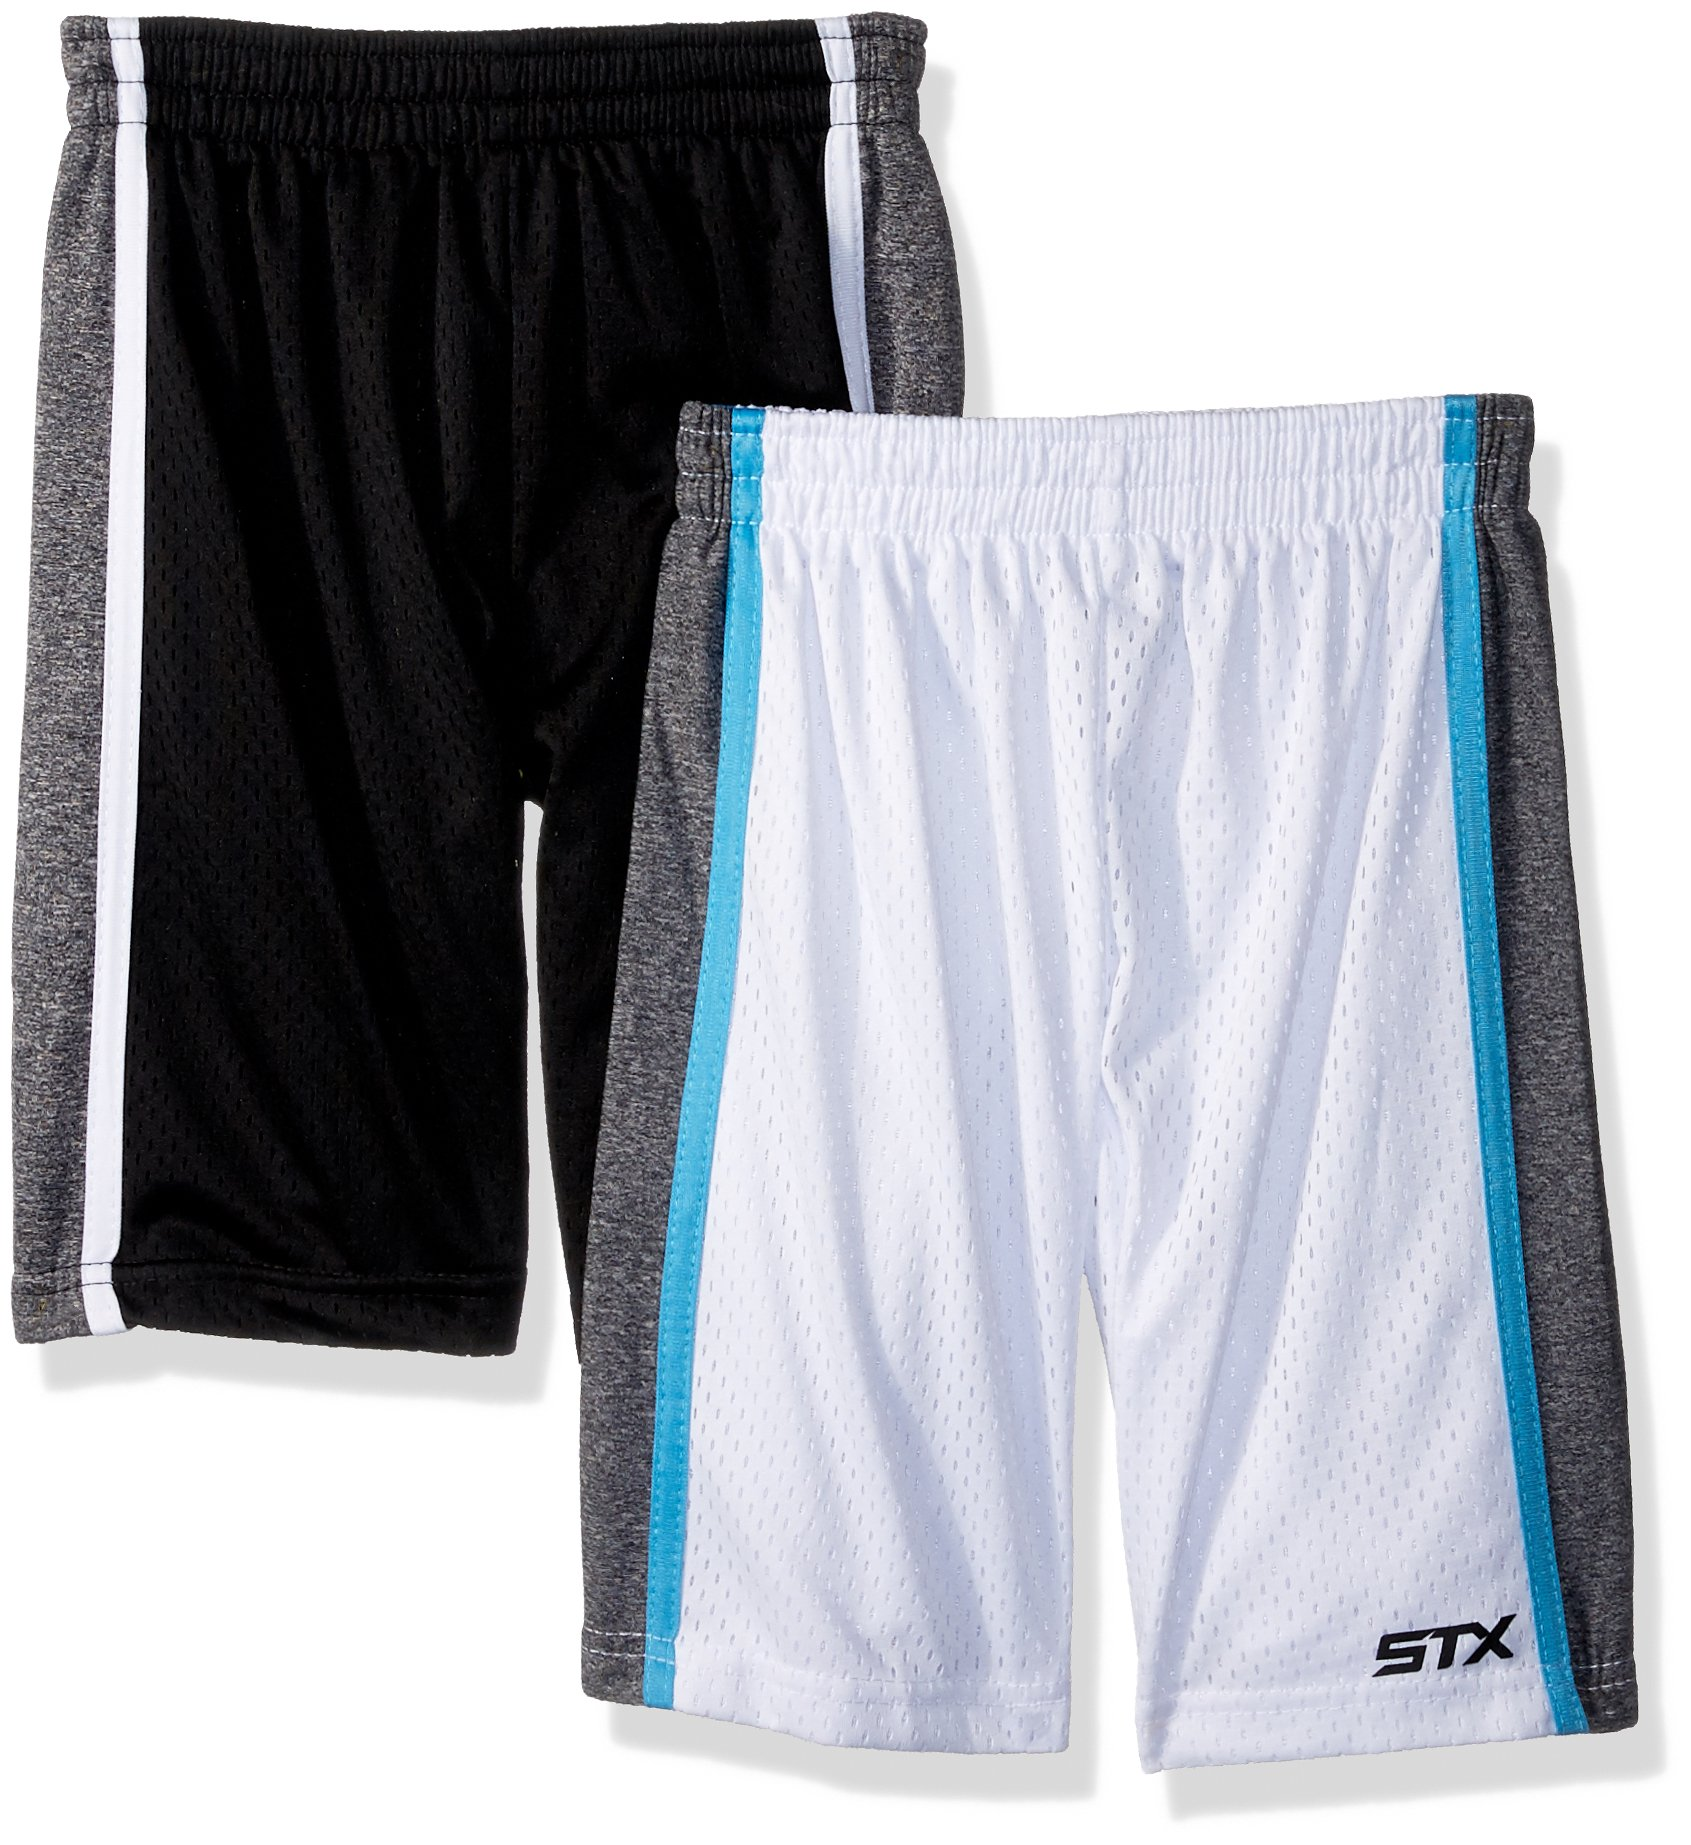 STX Fashion Toddler Boys' 2 Pack Performance Athletic Sport Shorts, Black/White, 2T